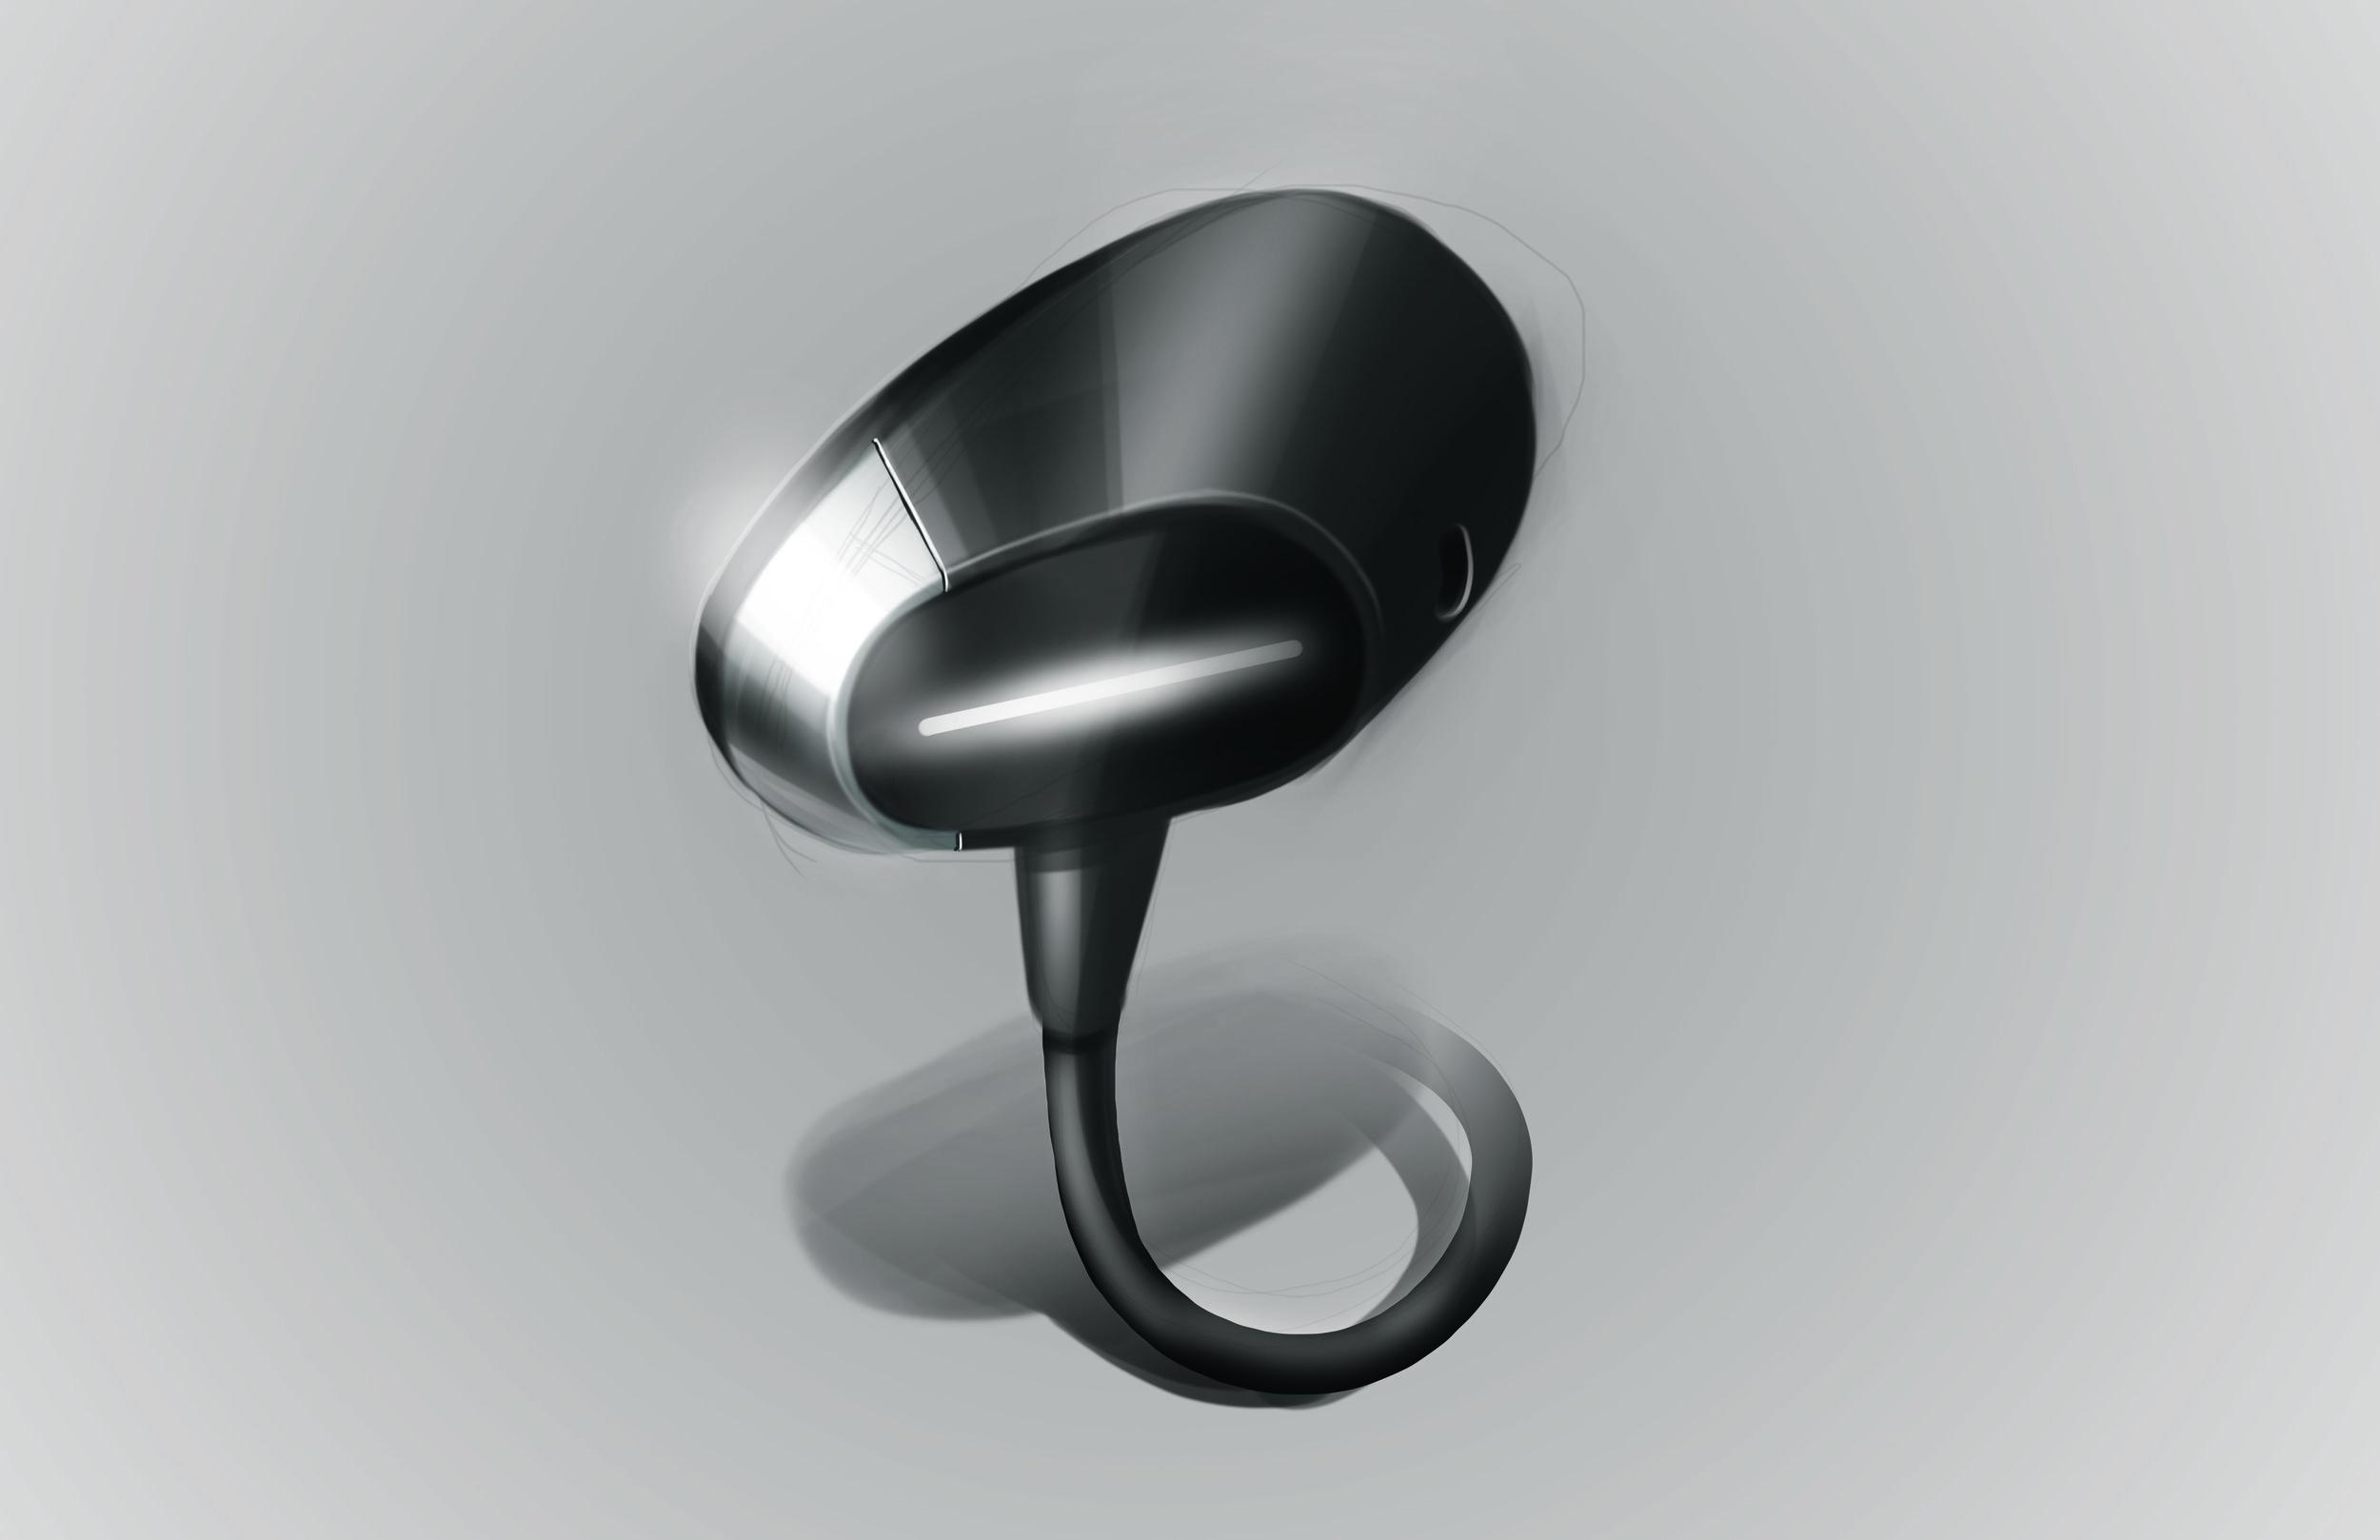 AUD01-concept 6.jpg